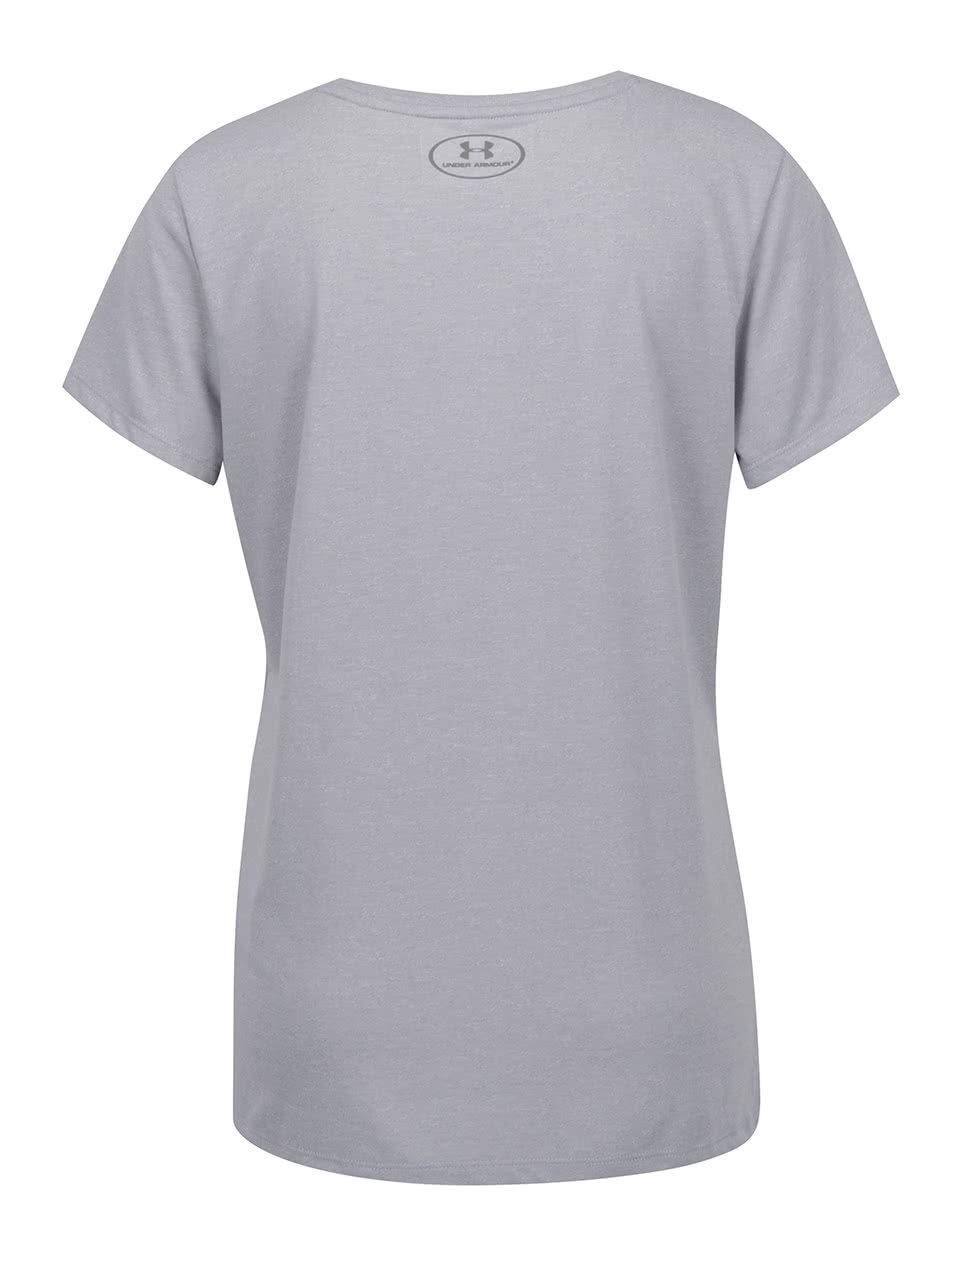 Sivé dámske športové tričko Under Armour Crew twist ... 7e6f62b9049